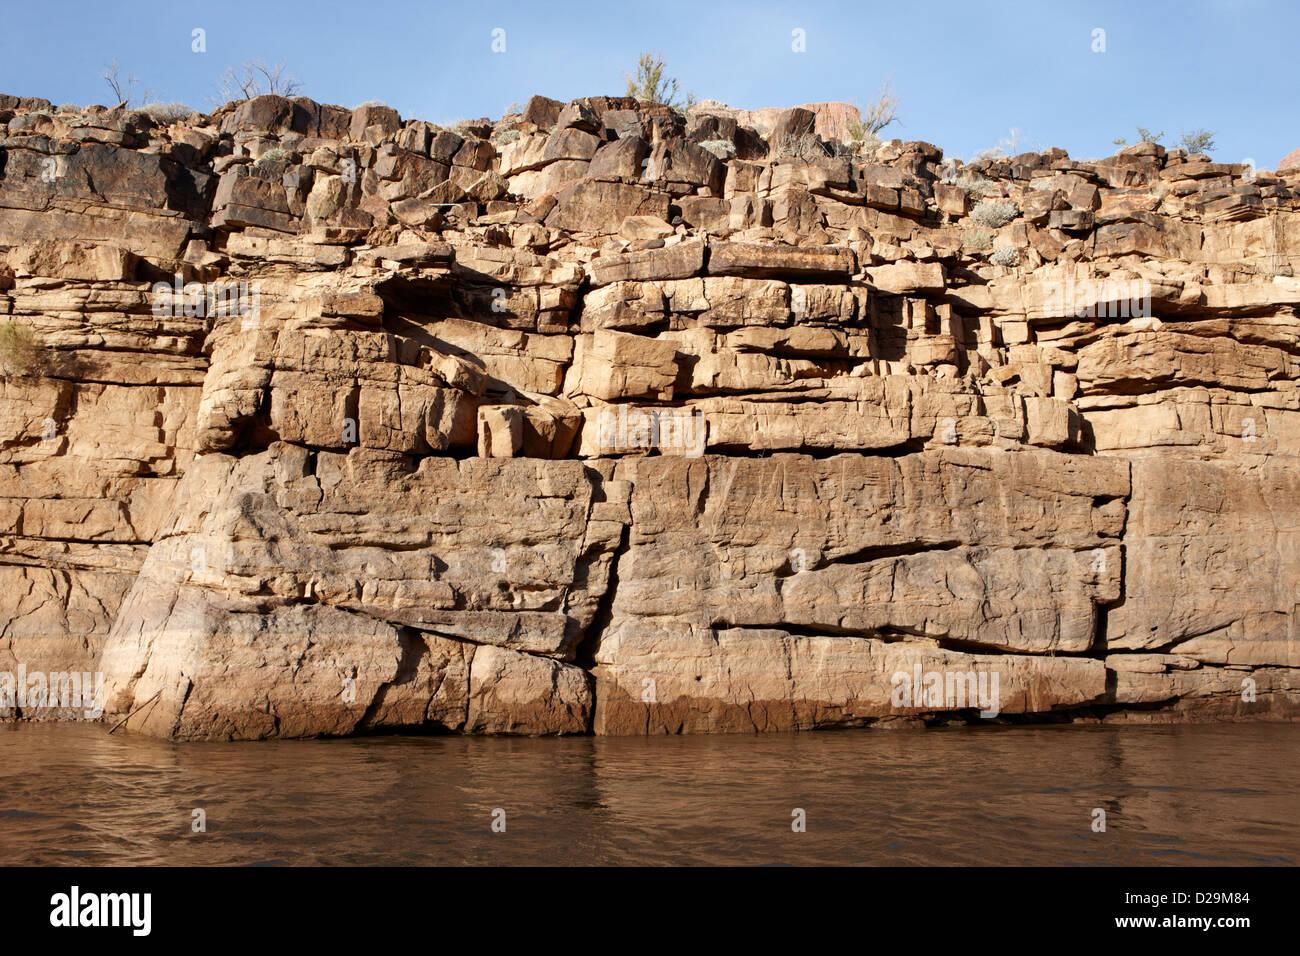 rock strata on the banks of the colorado river bottom of the grand canyon Arizona USA - Stock Image